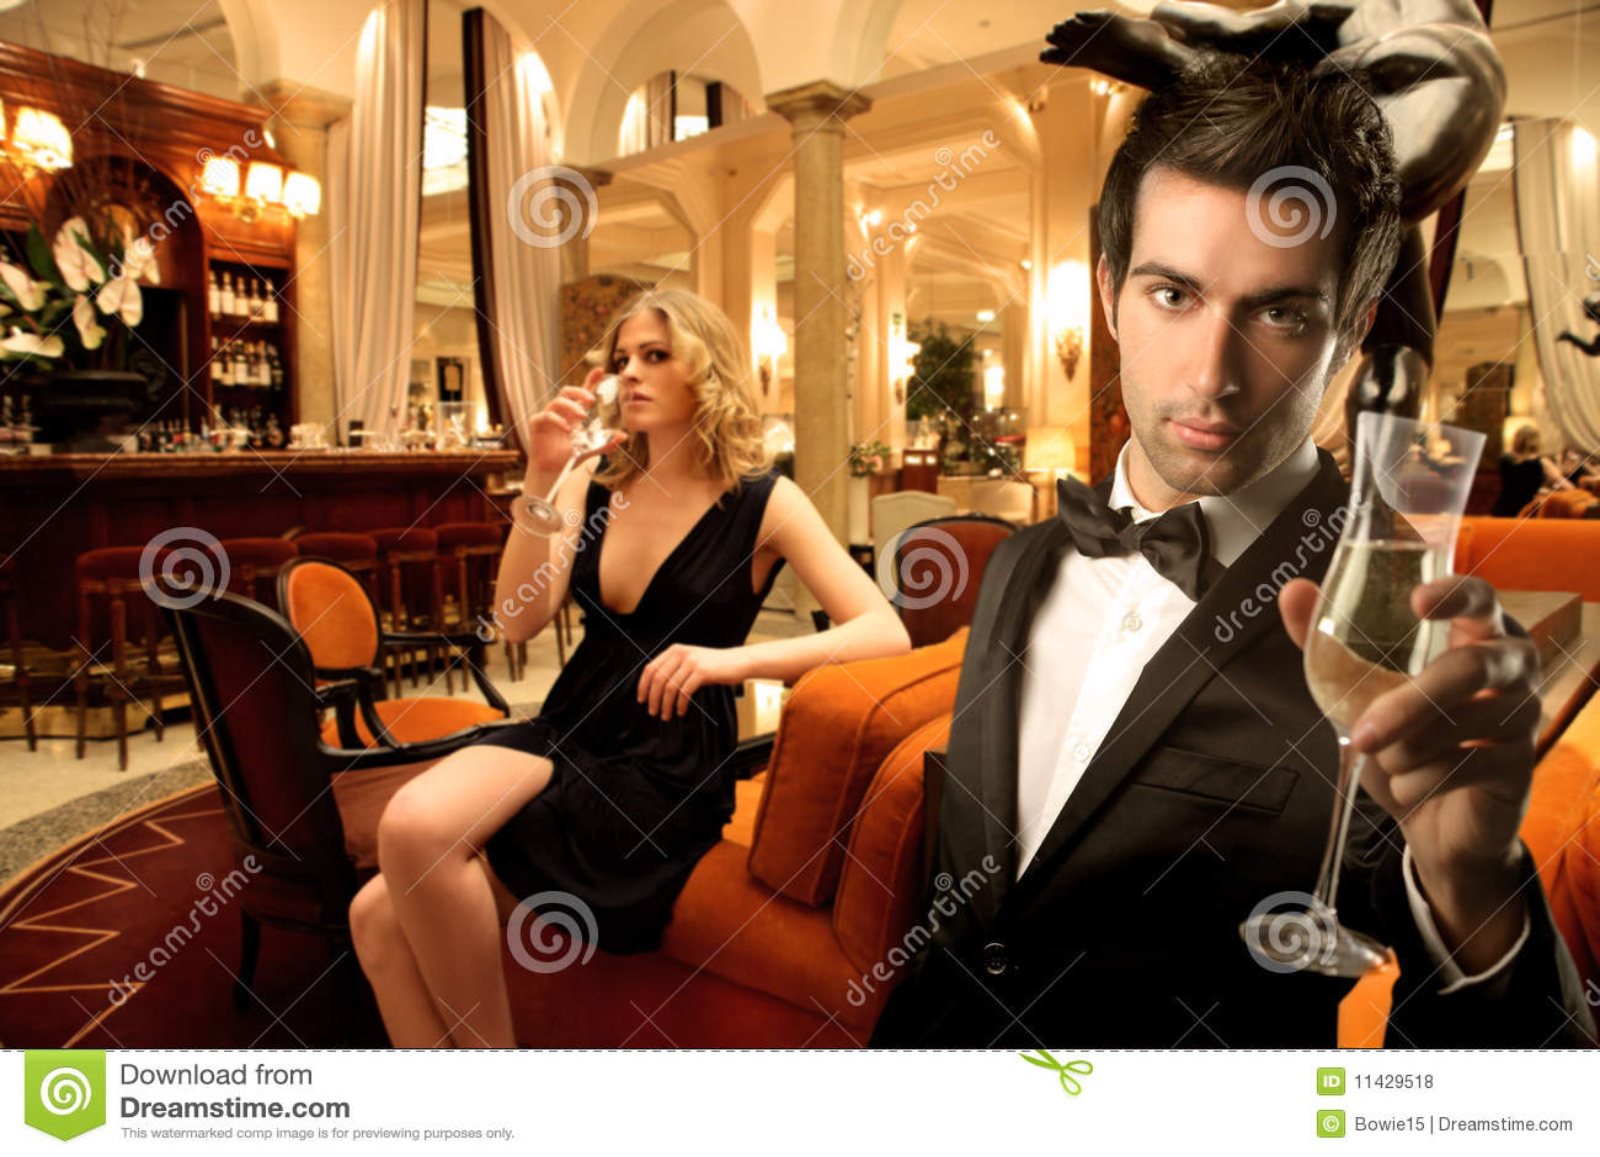 Снял в баре онлайн 3 фотография